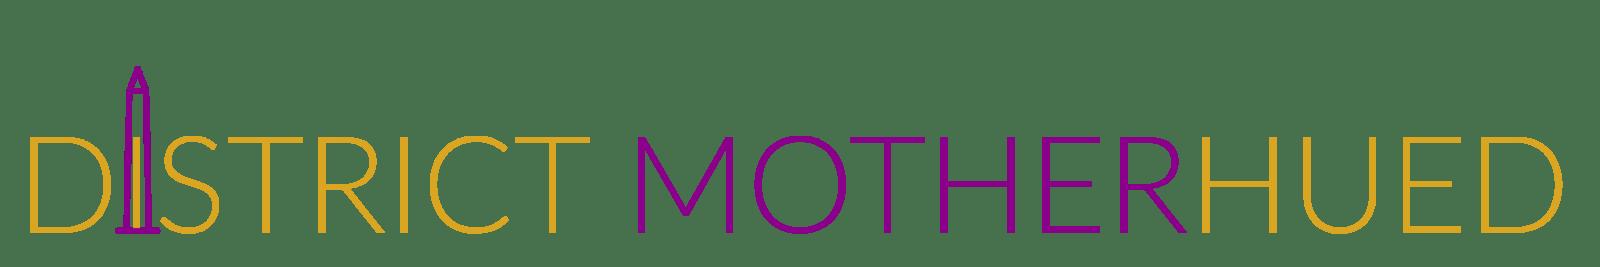 Distritct-Motherhued-LOGO.png